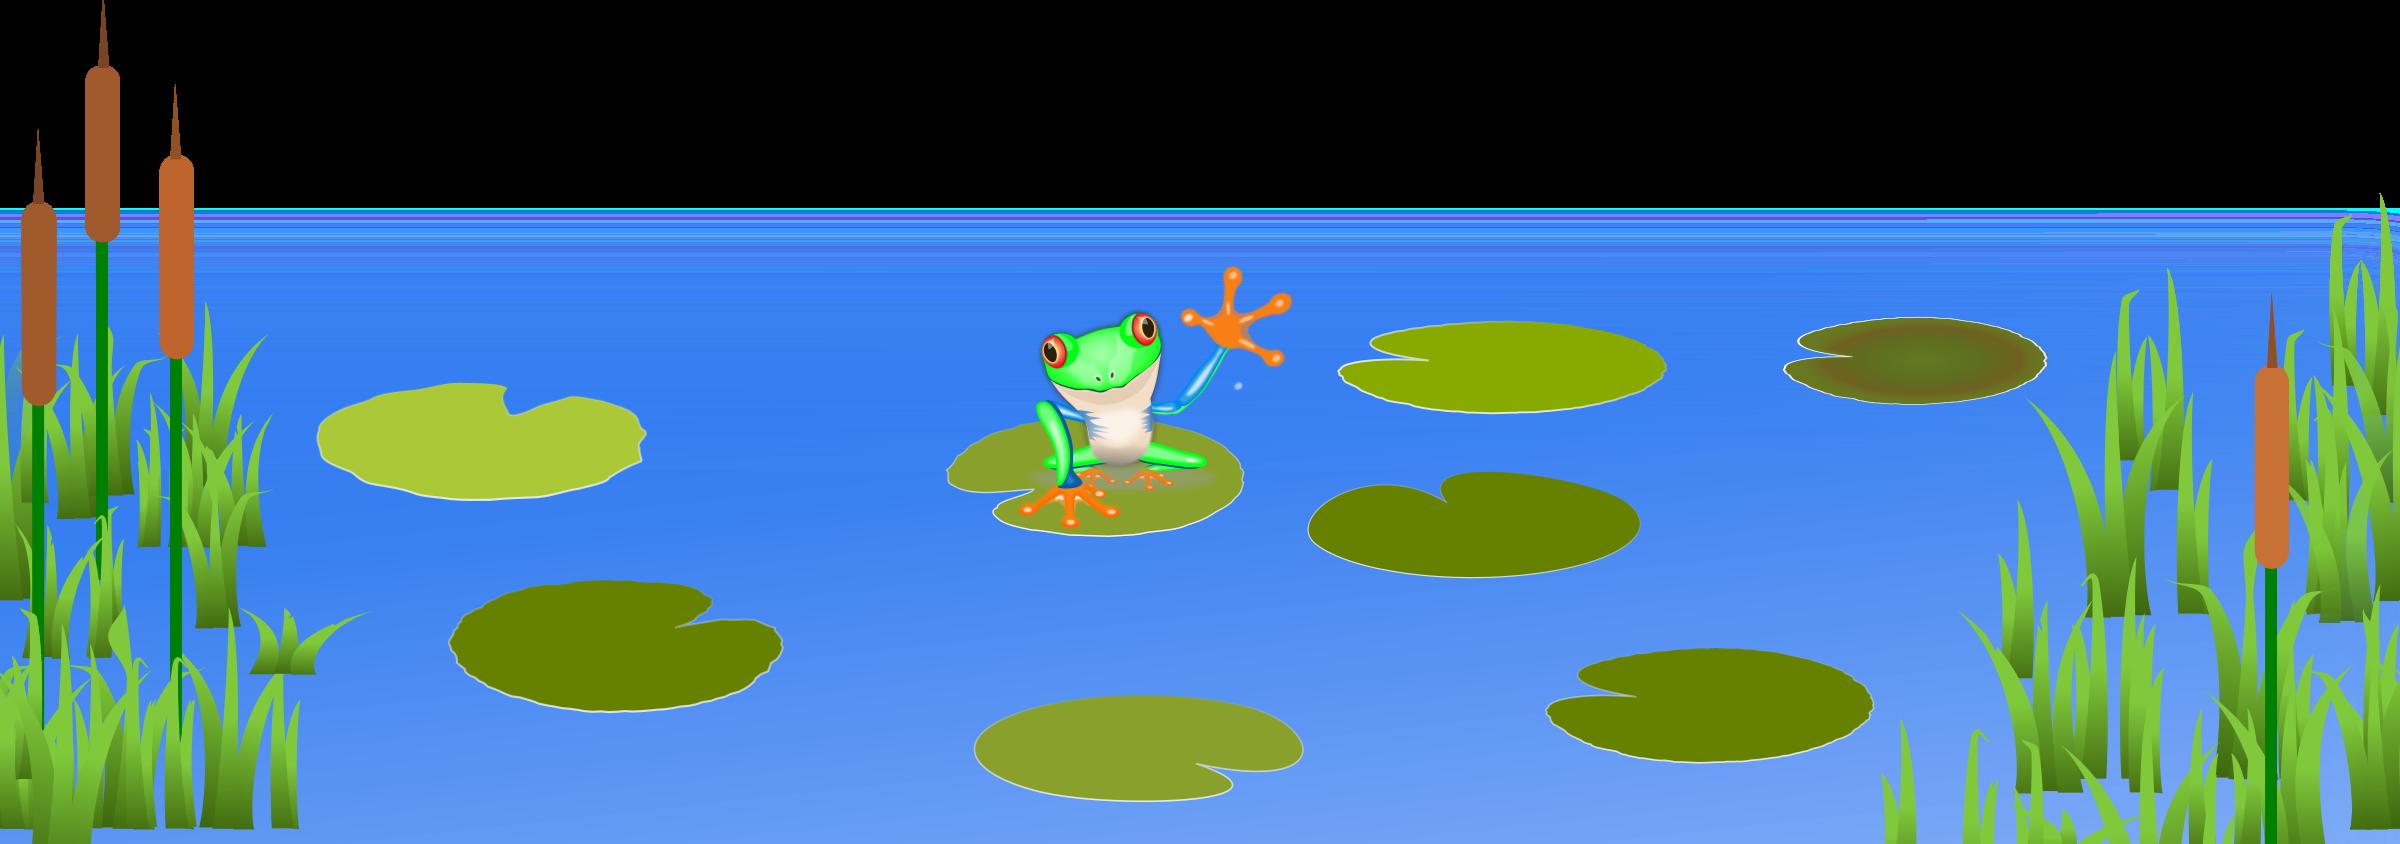 Frog scene